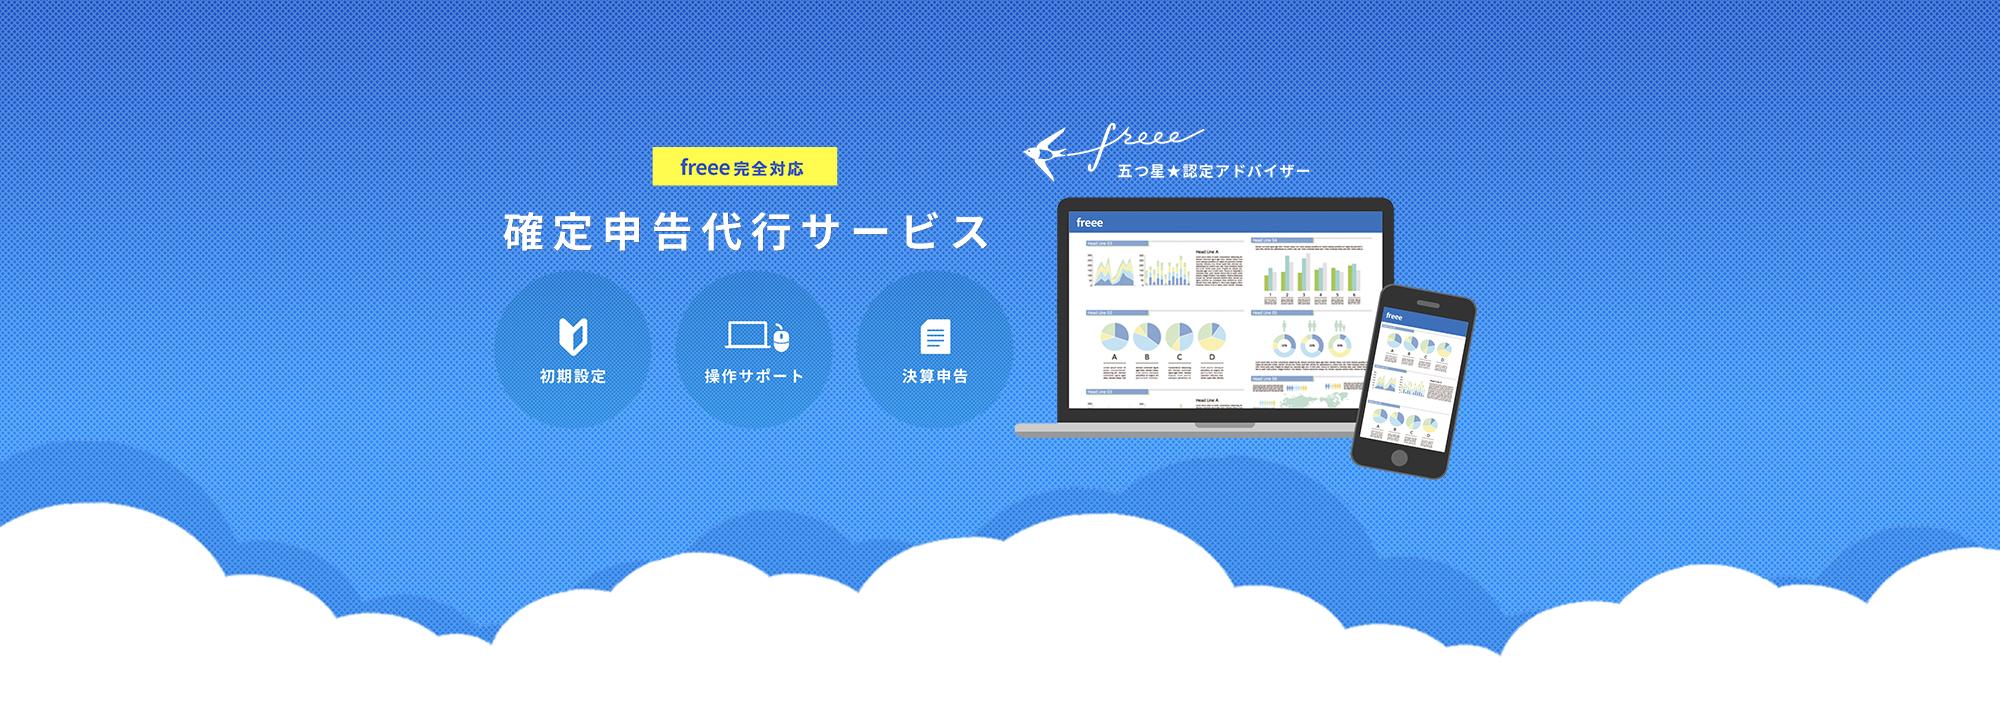 freee認定アドバイザー事務所が提供する、freeeの「即・100%活用」サポート